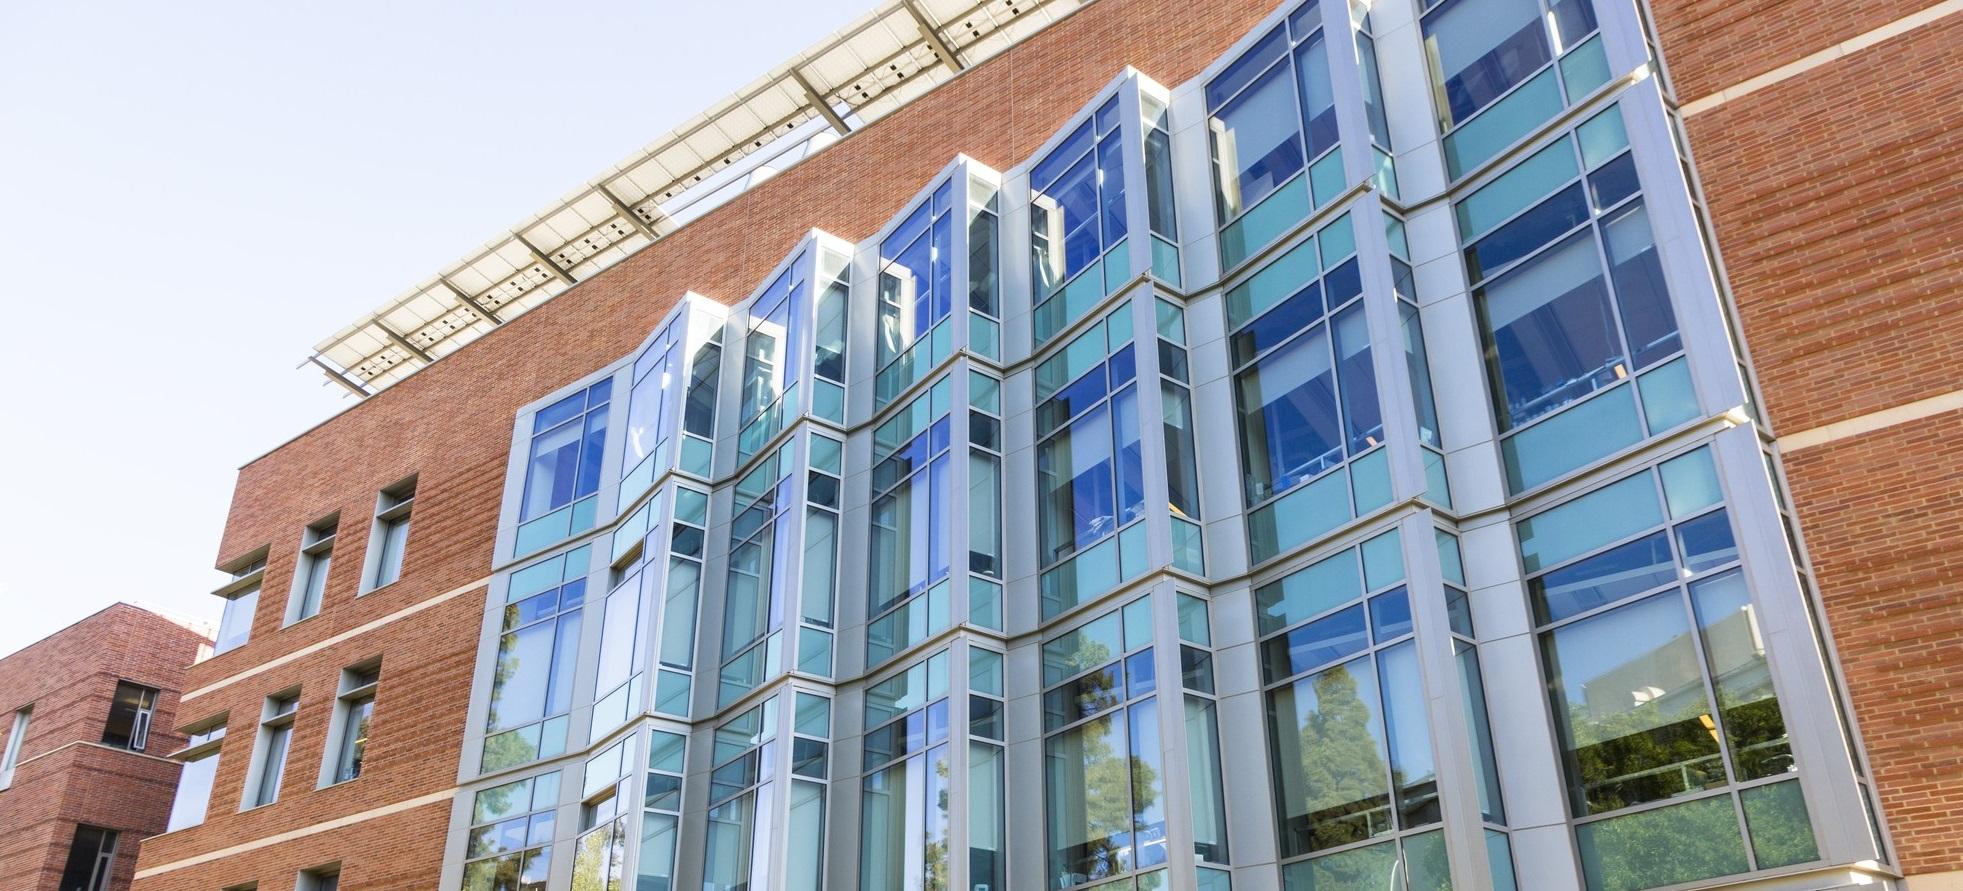 Windows of UCLA Engineering 6 Building, from outside. Derek Yan/Daily Bruin